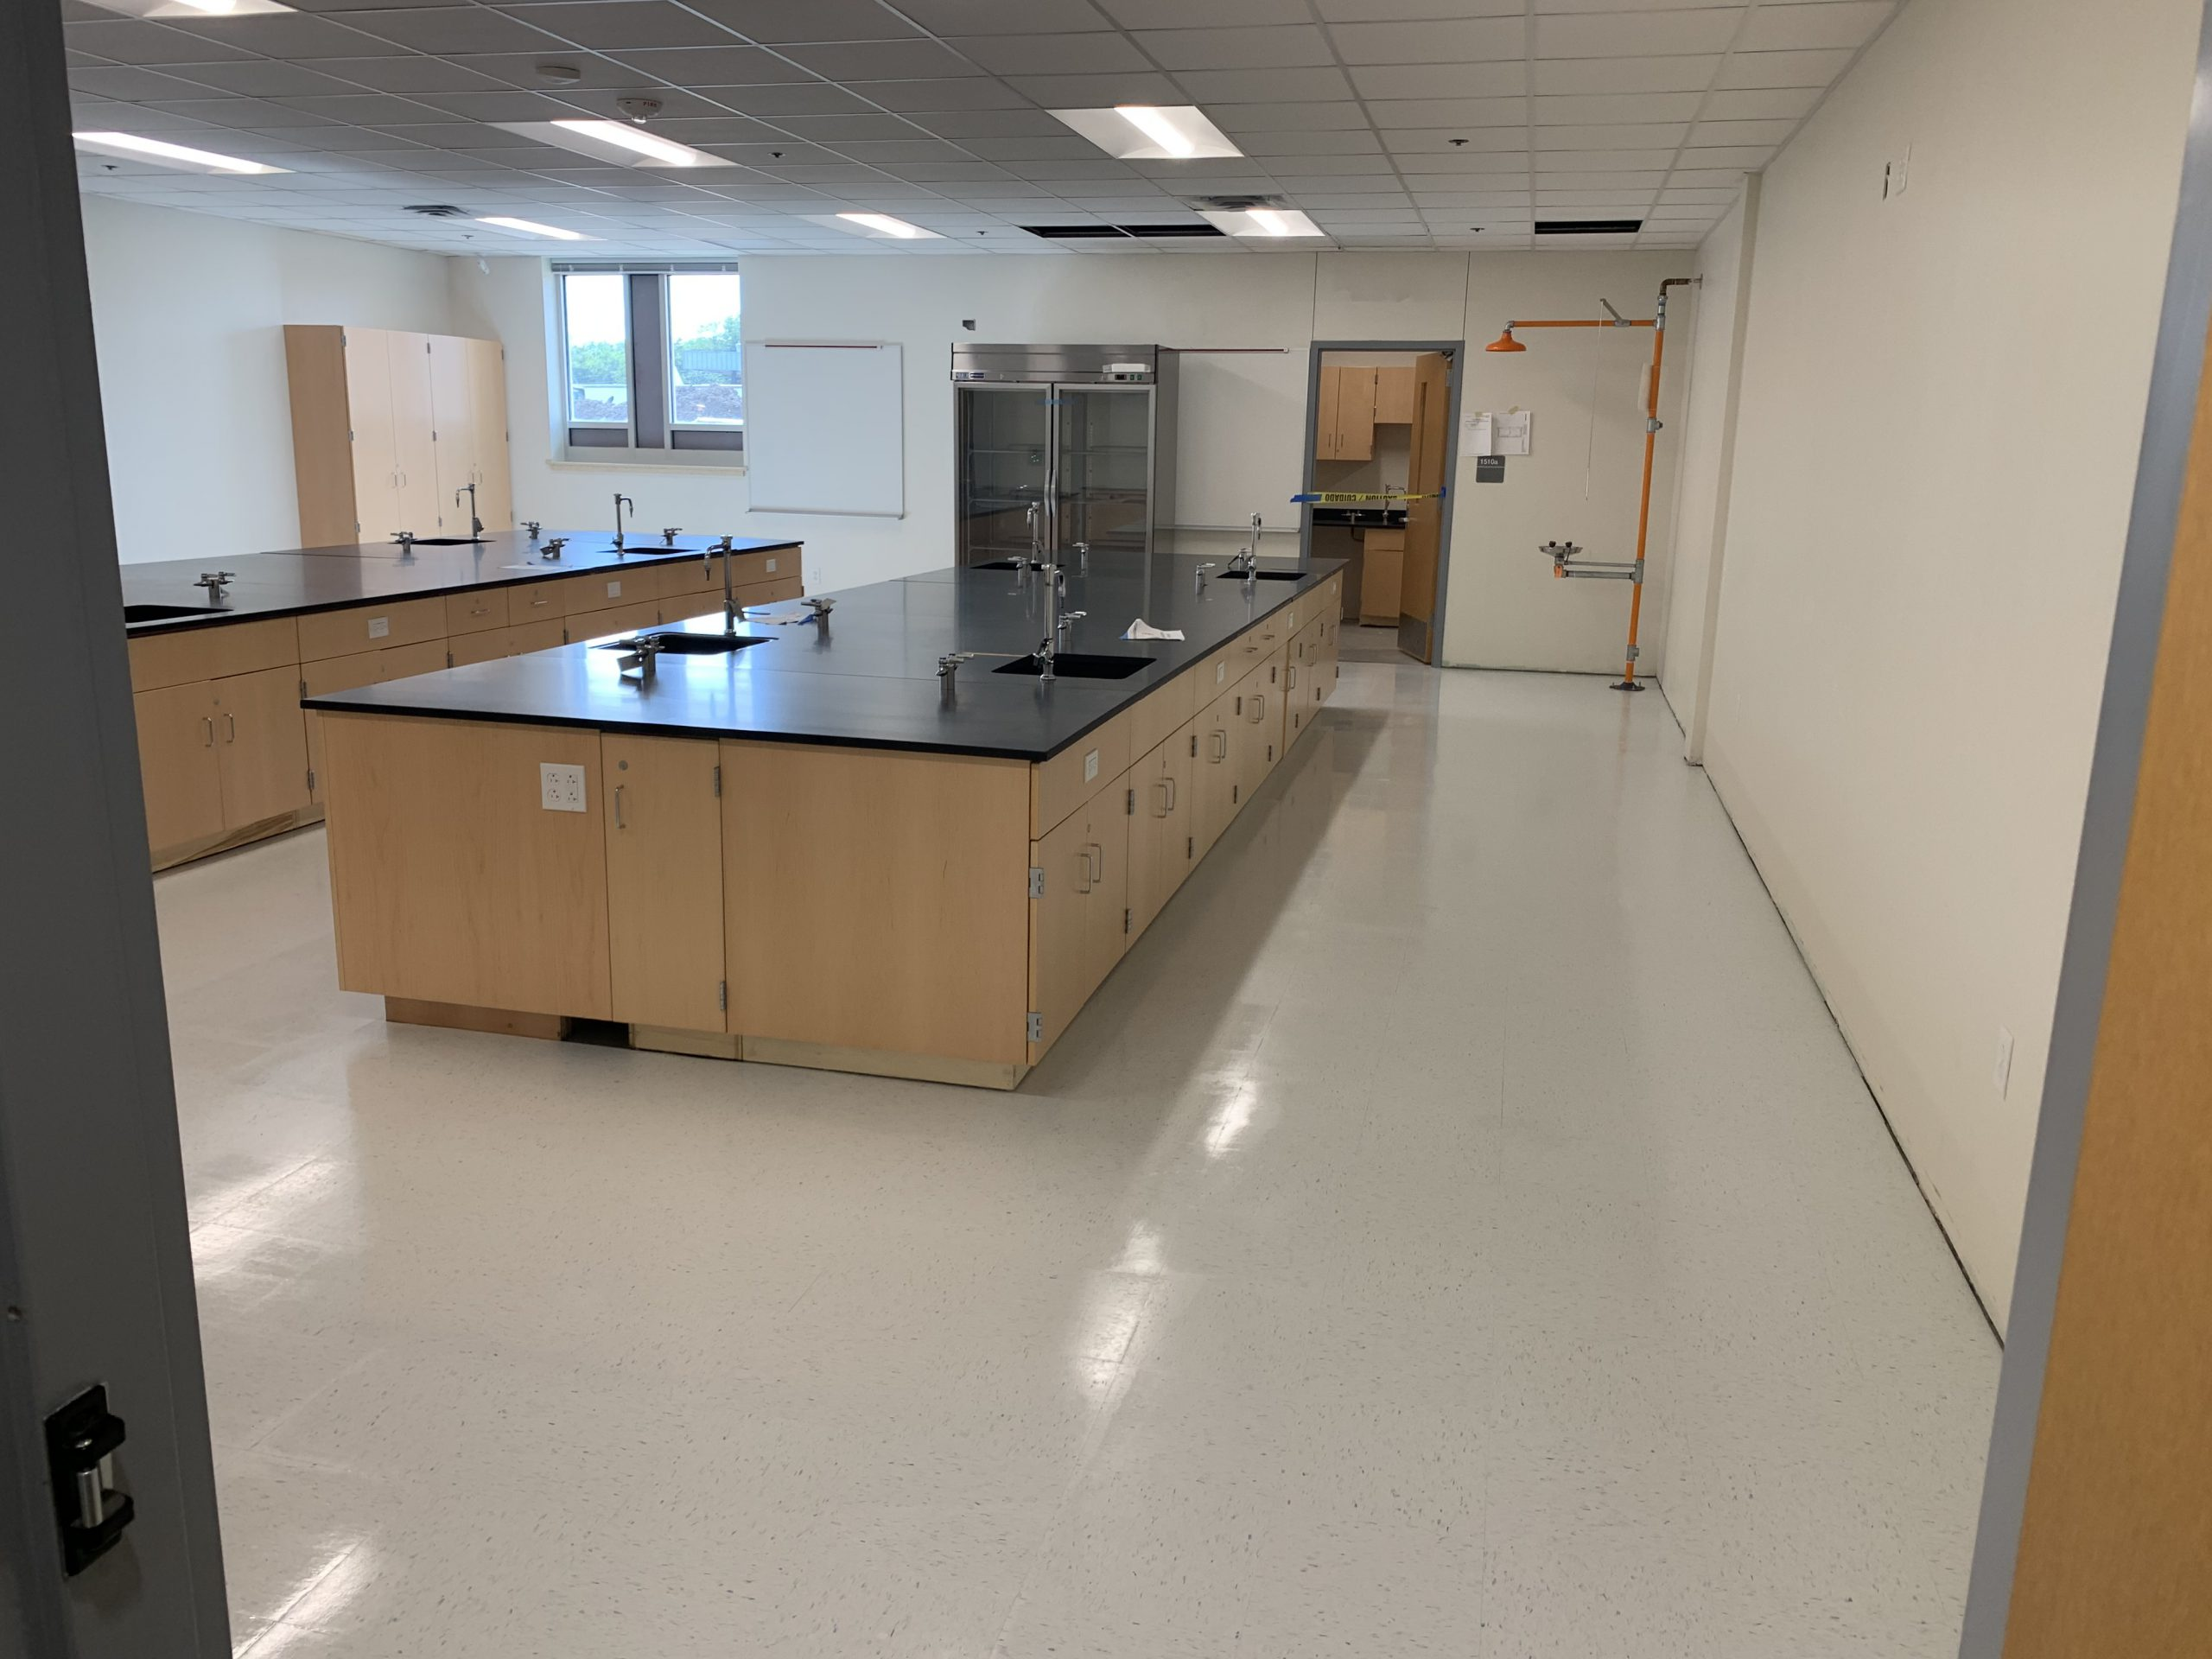 Science Lab image 0